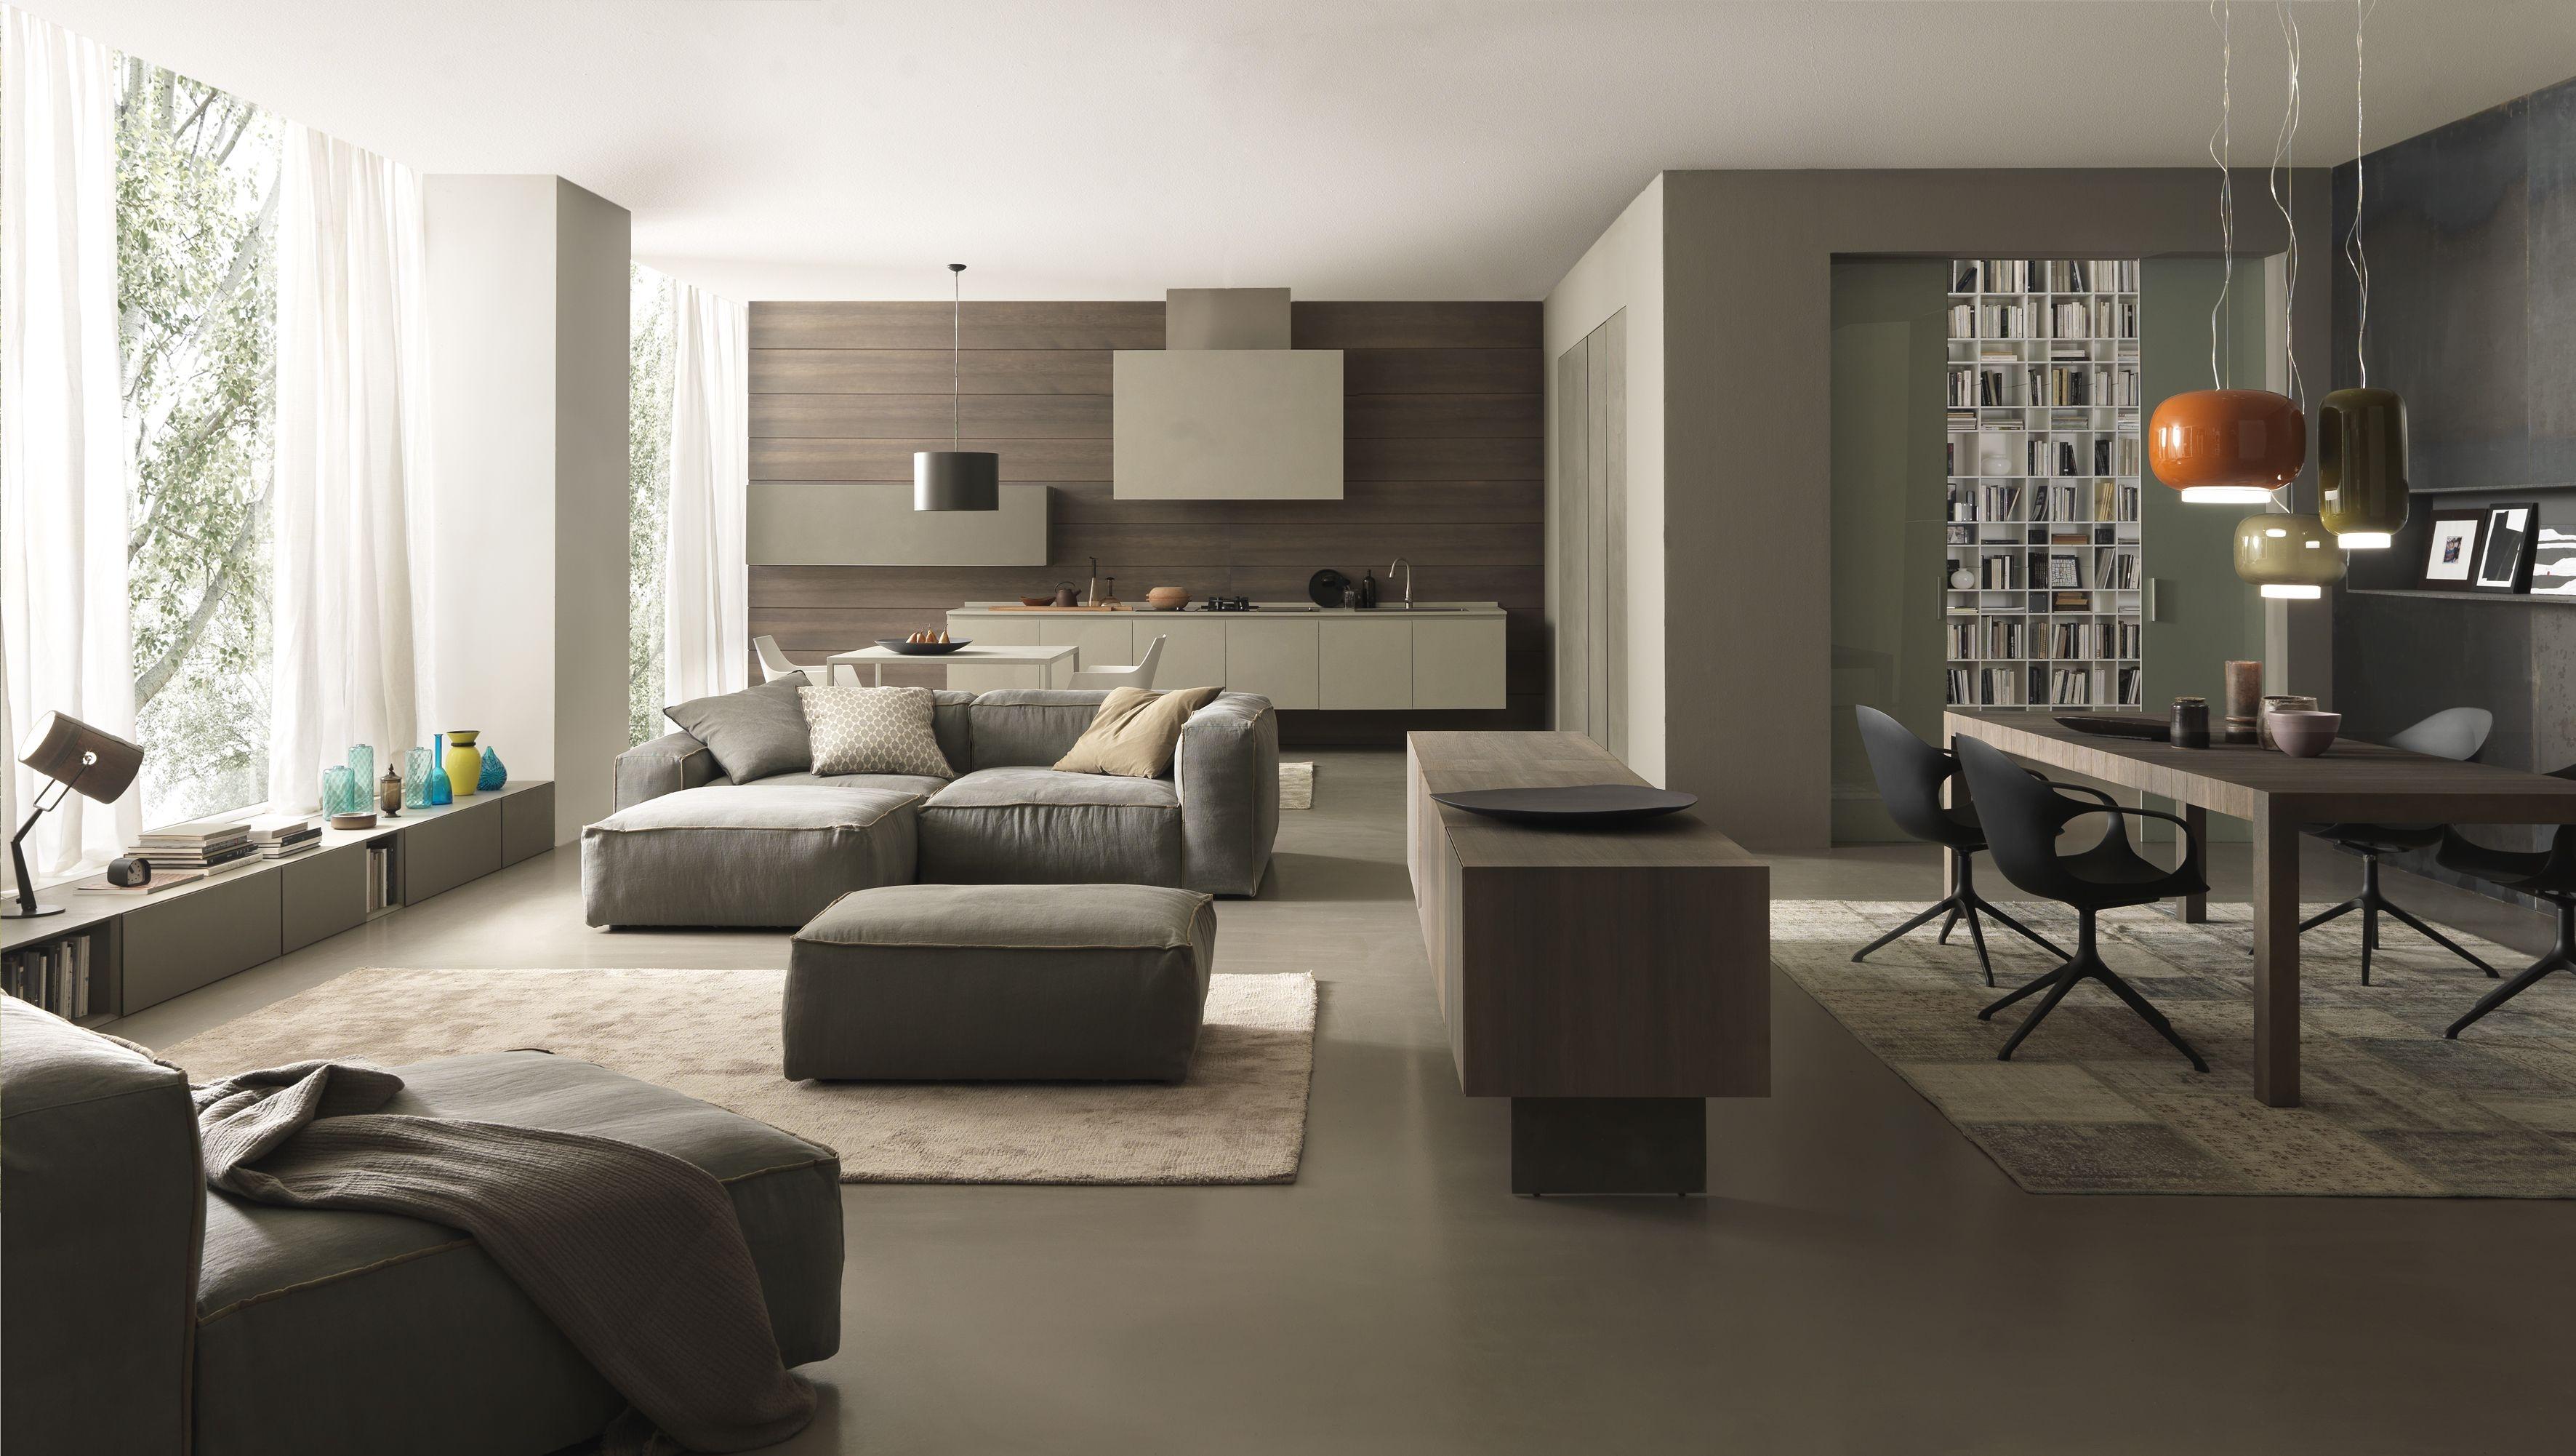 Progettazione arredamento di interni a genova arte in casa overplace - Arredamenti interni case moderne ...